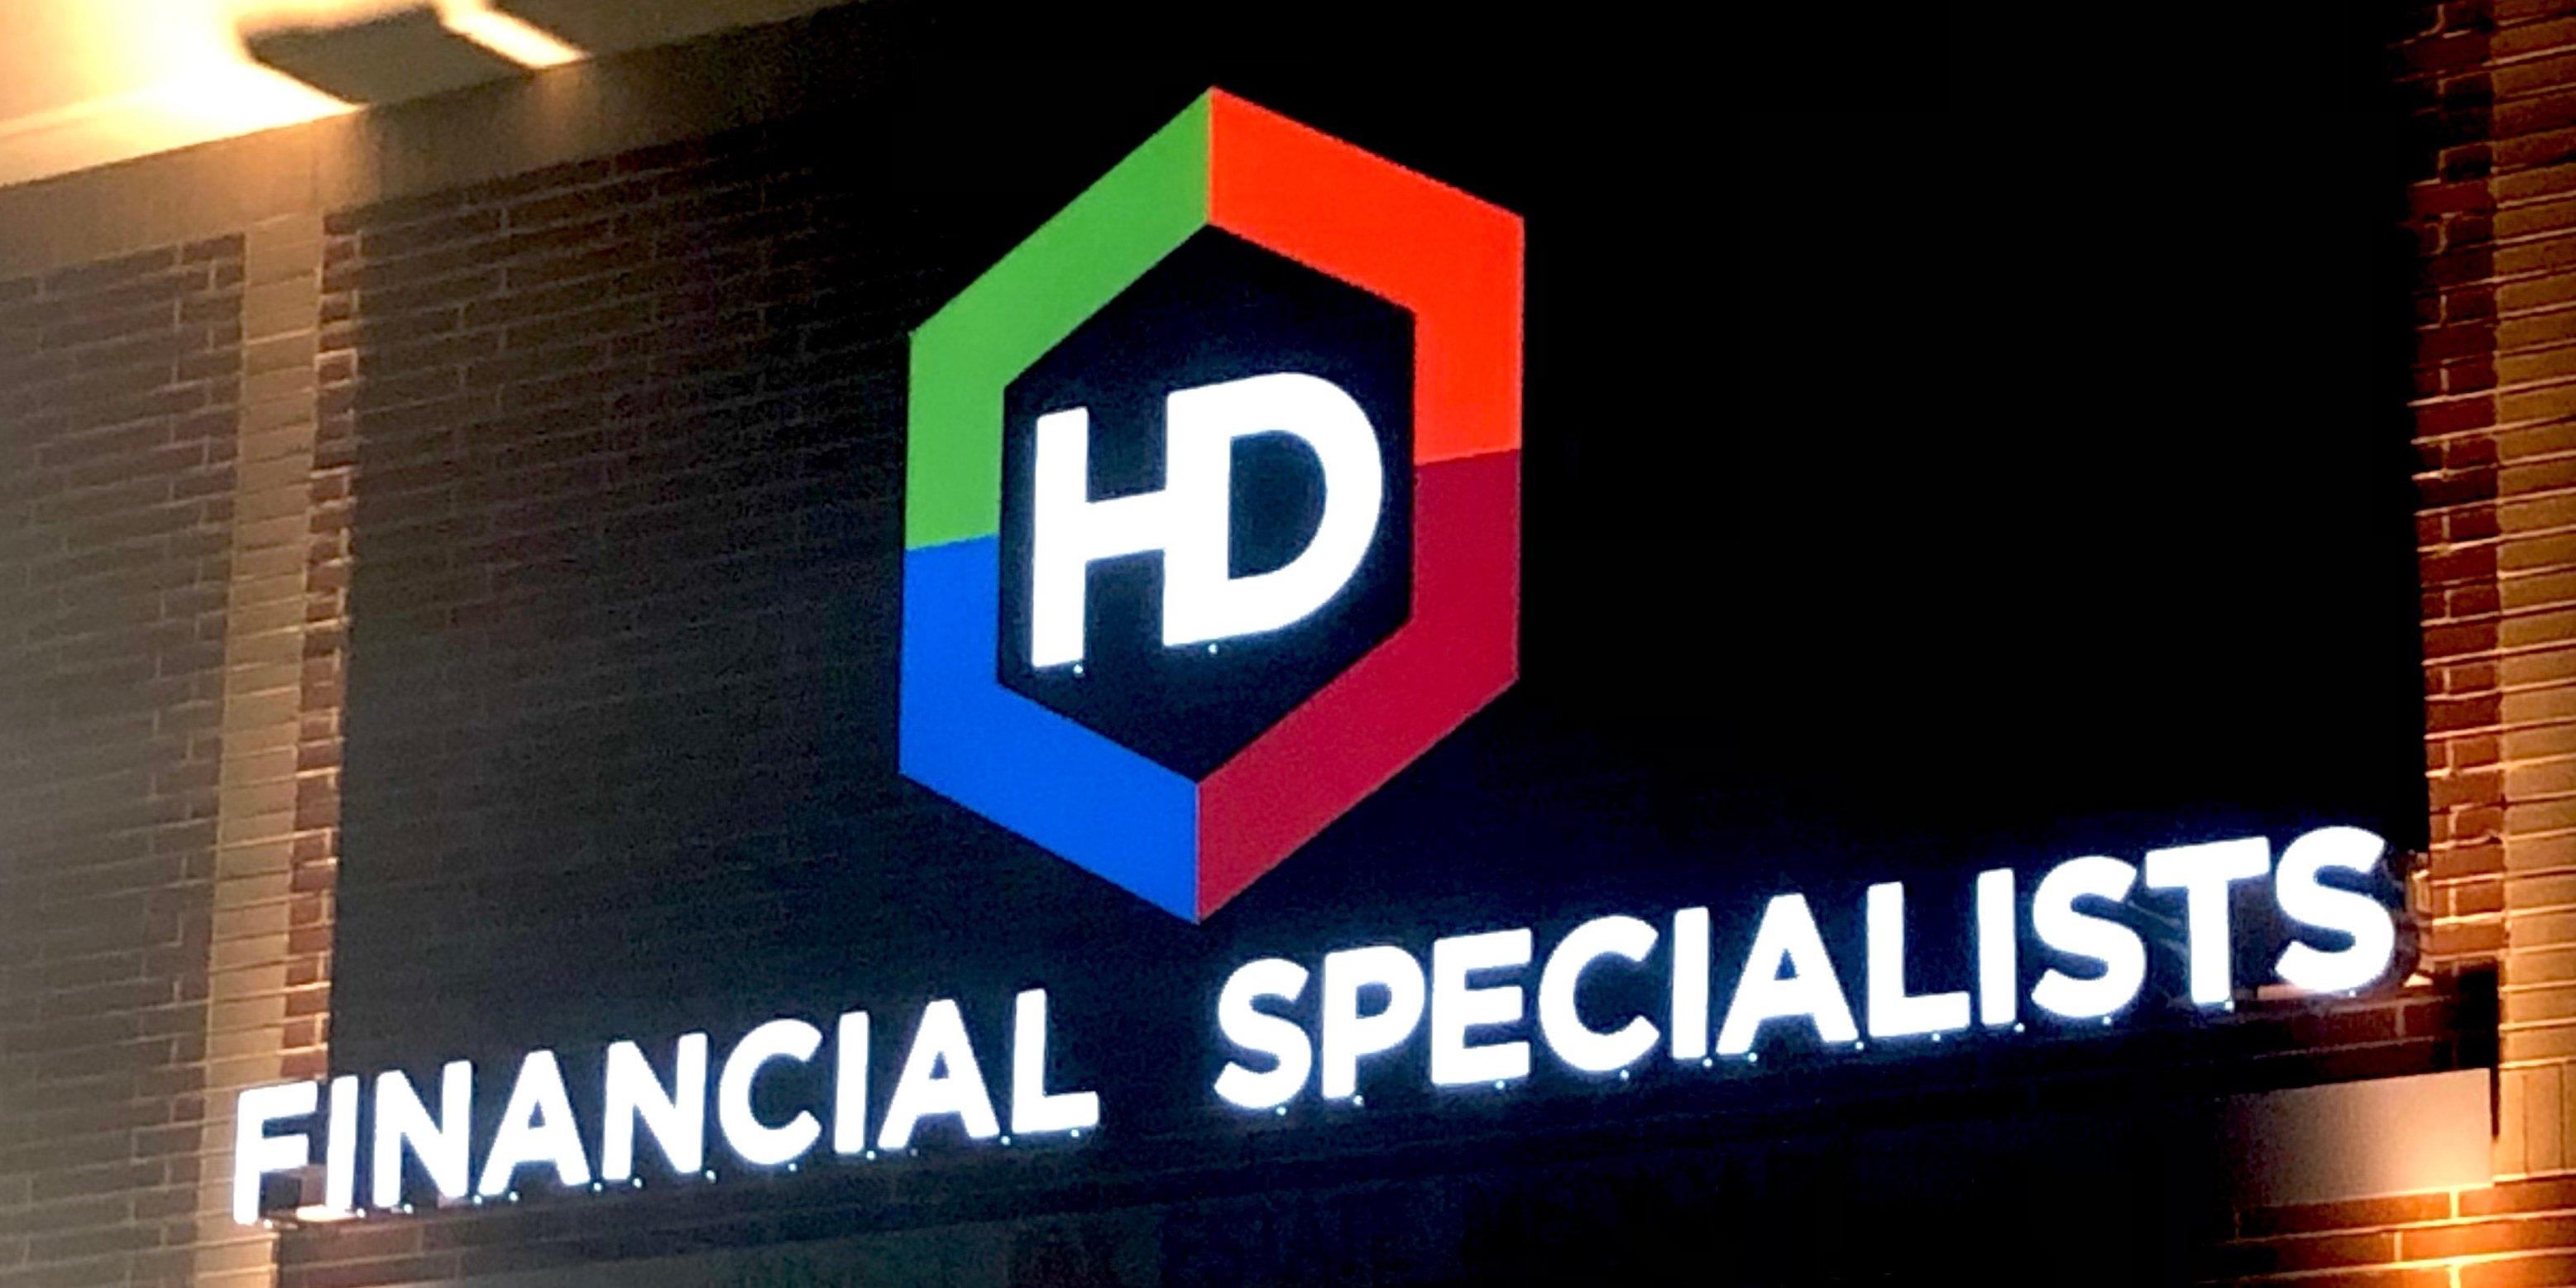 HD Financial - Custom Channel Letter Logo Sign Installed - Nighttime 5